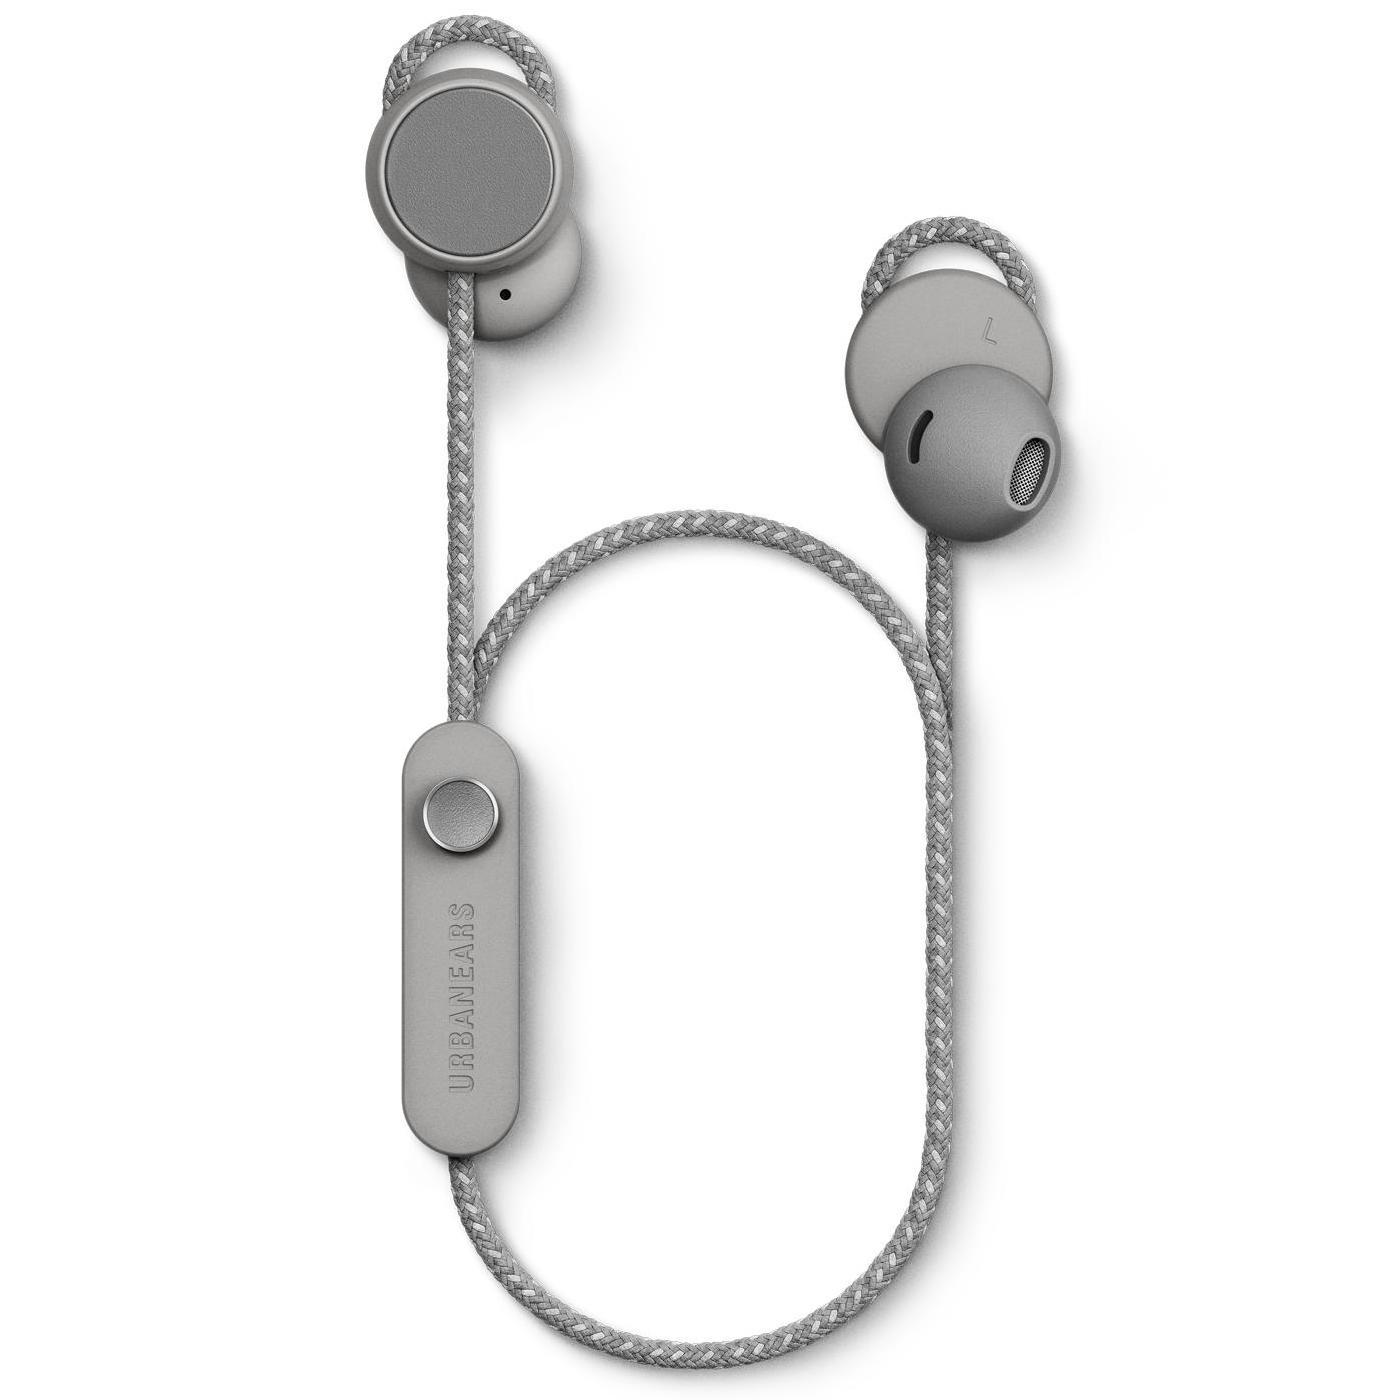 Urbanears Philippines Speaker For Sale Prices Plattan Ii Snow Blue Jakan Bluetooth Wireless Headphones Ash Grey